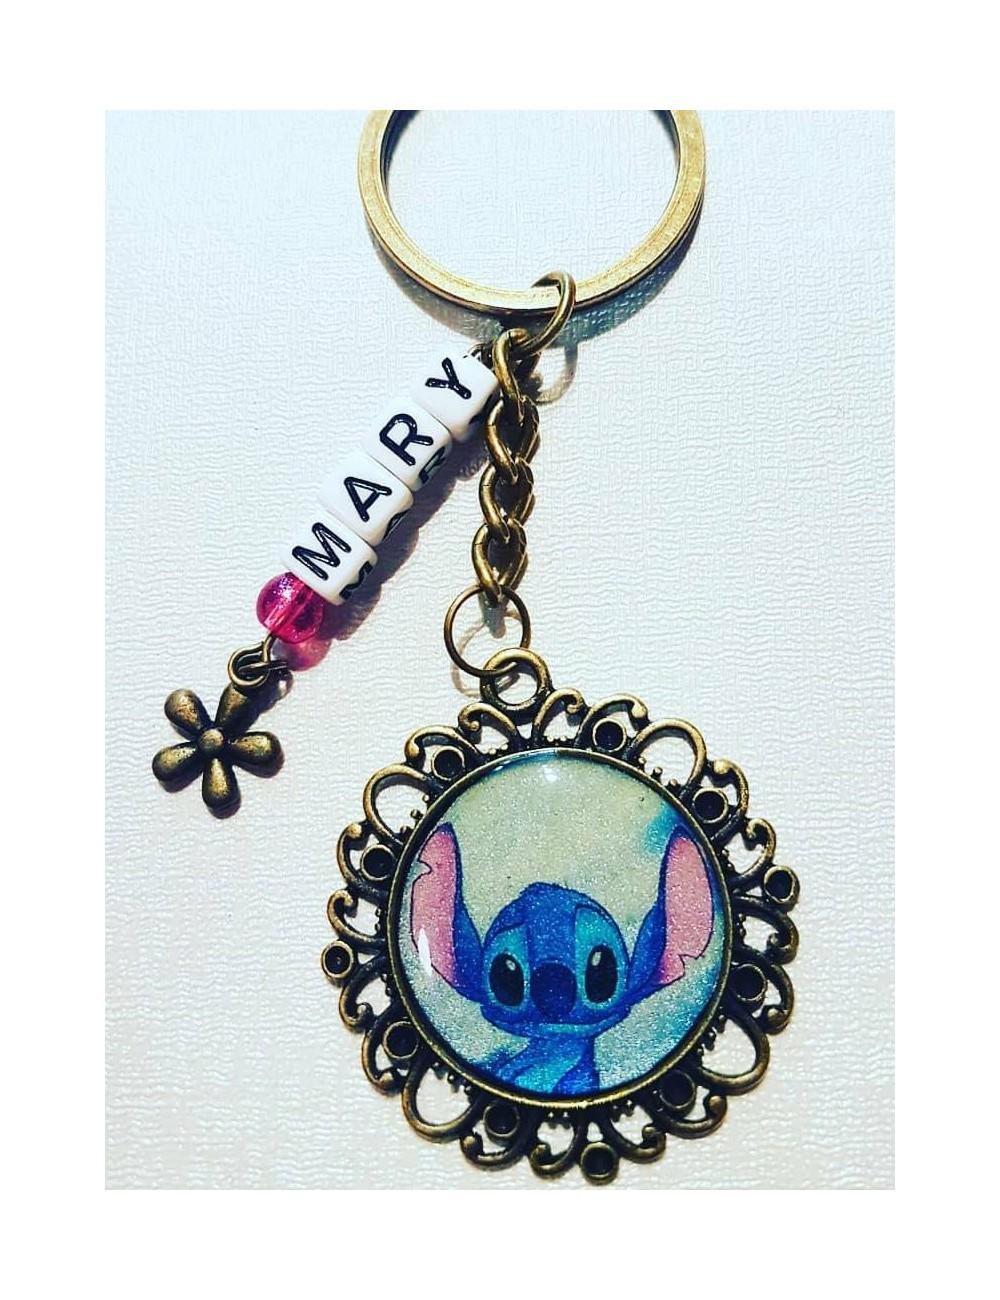 Llavero artesanal diseño de Stitch